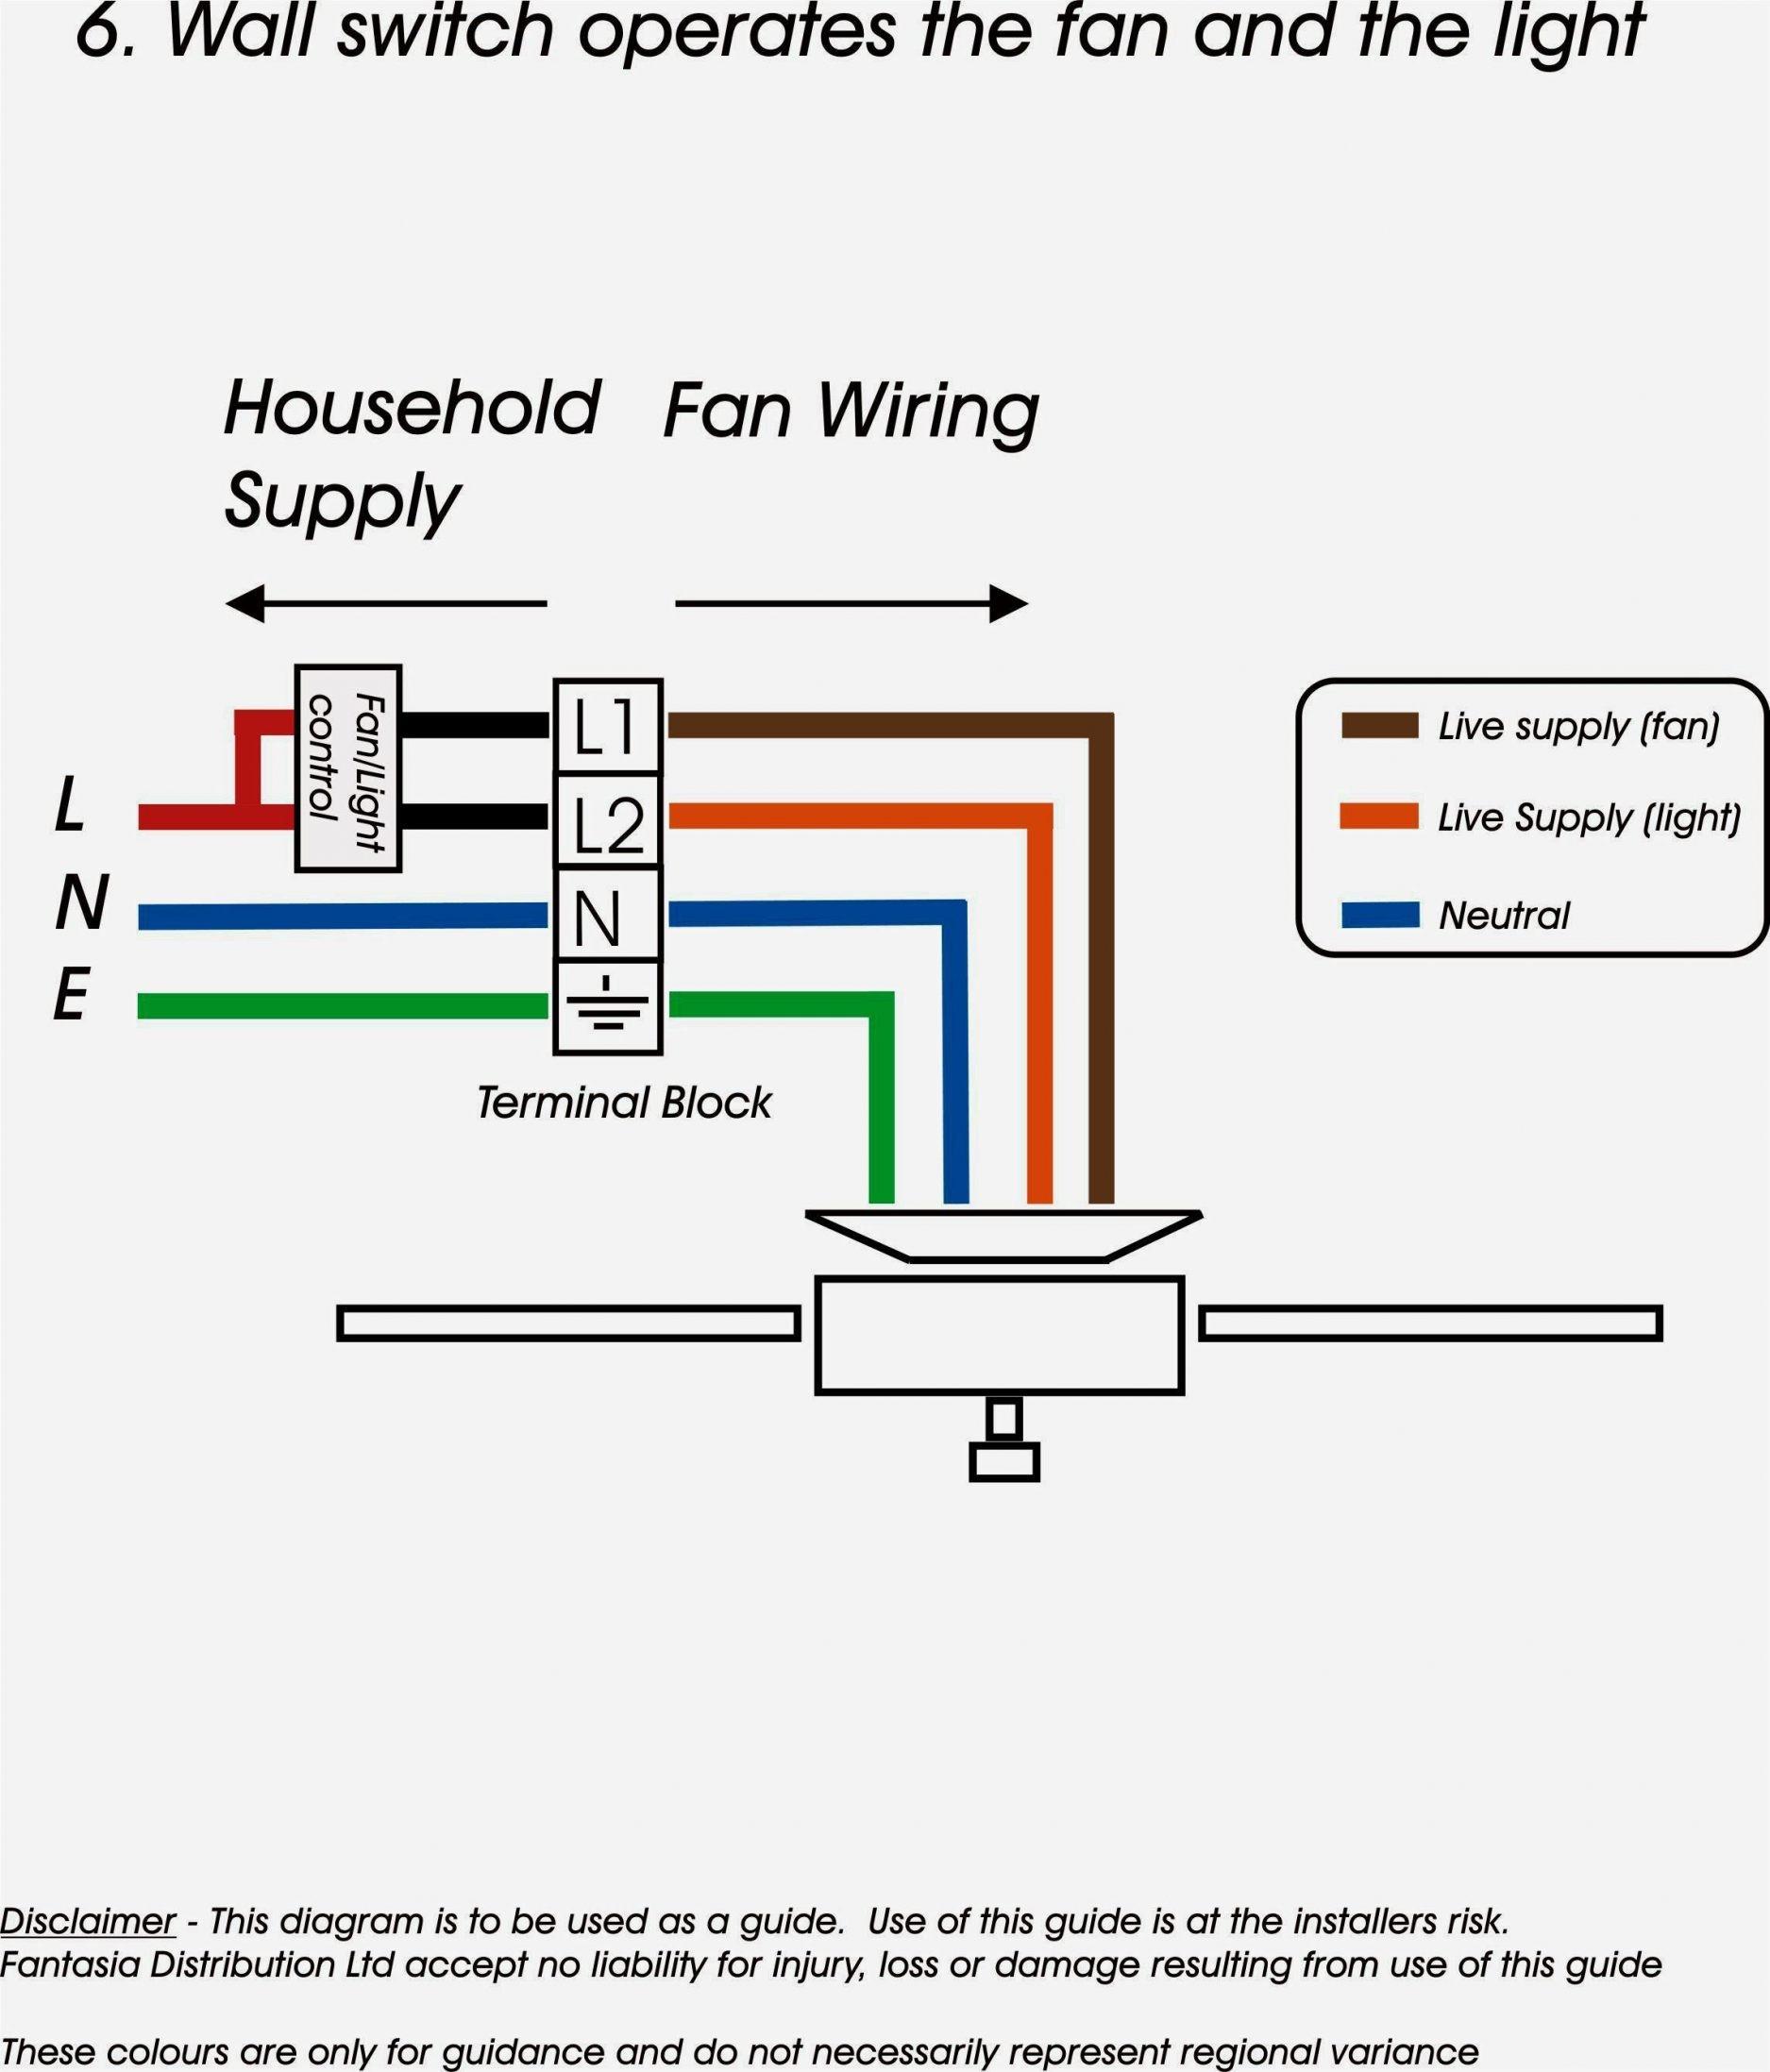 fulham workhorse ballast wiring diagram manual e books Wh7 120L Wiring-Diagram workhorse 2 ballast wiring diagram detailed wiring diagramfulham wh2 120 c wiring diagram free wiring diagram